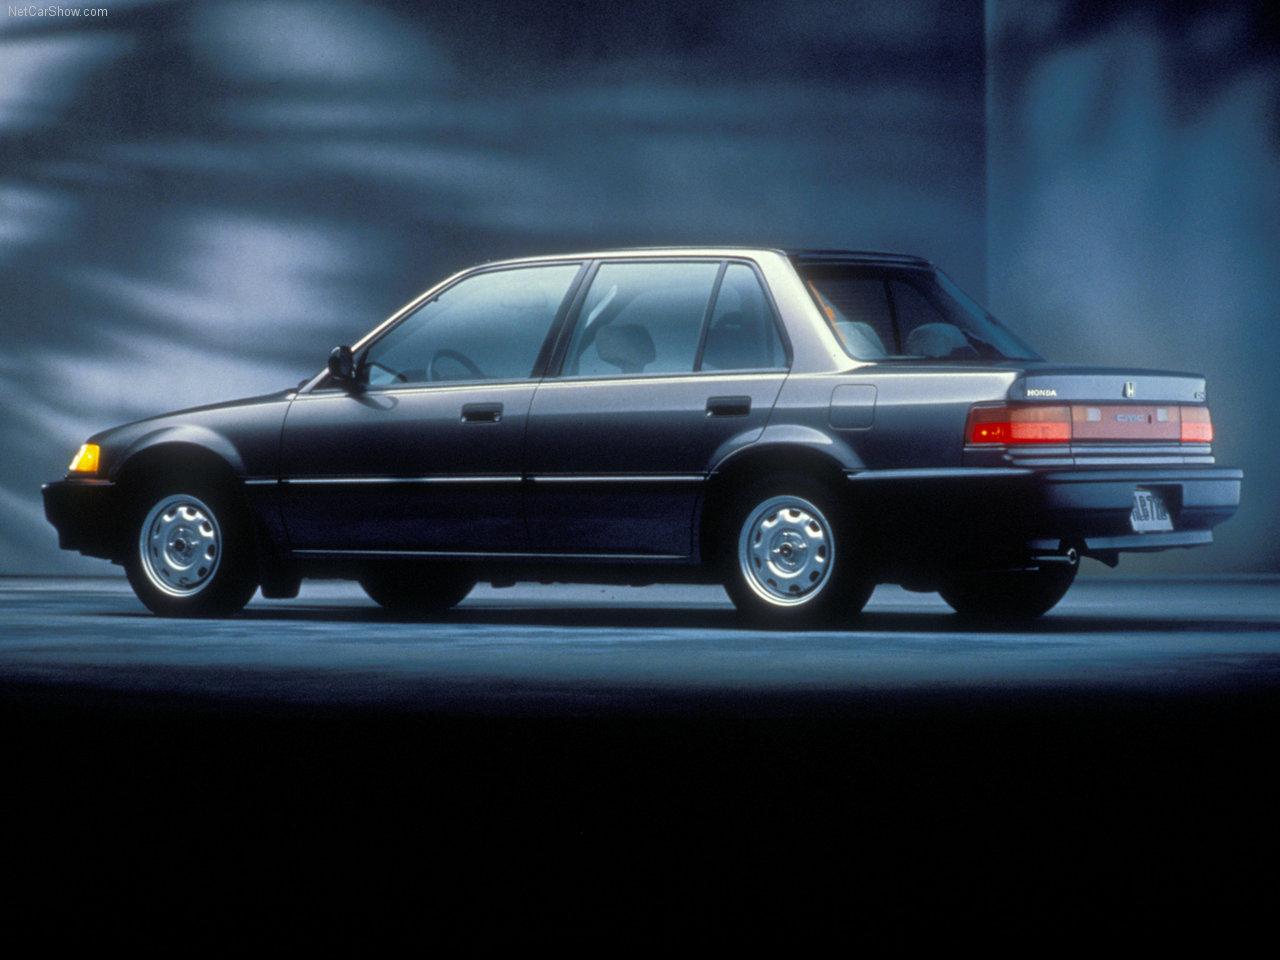 Honda Civic 1 6i Limousine Ed4 Honda Forum Amp Tuning